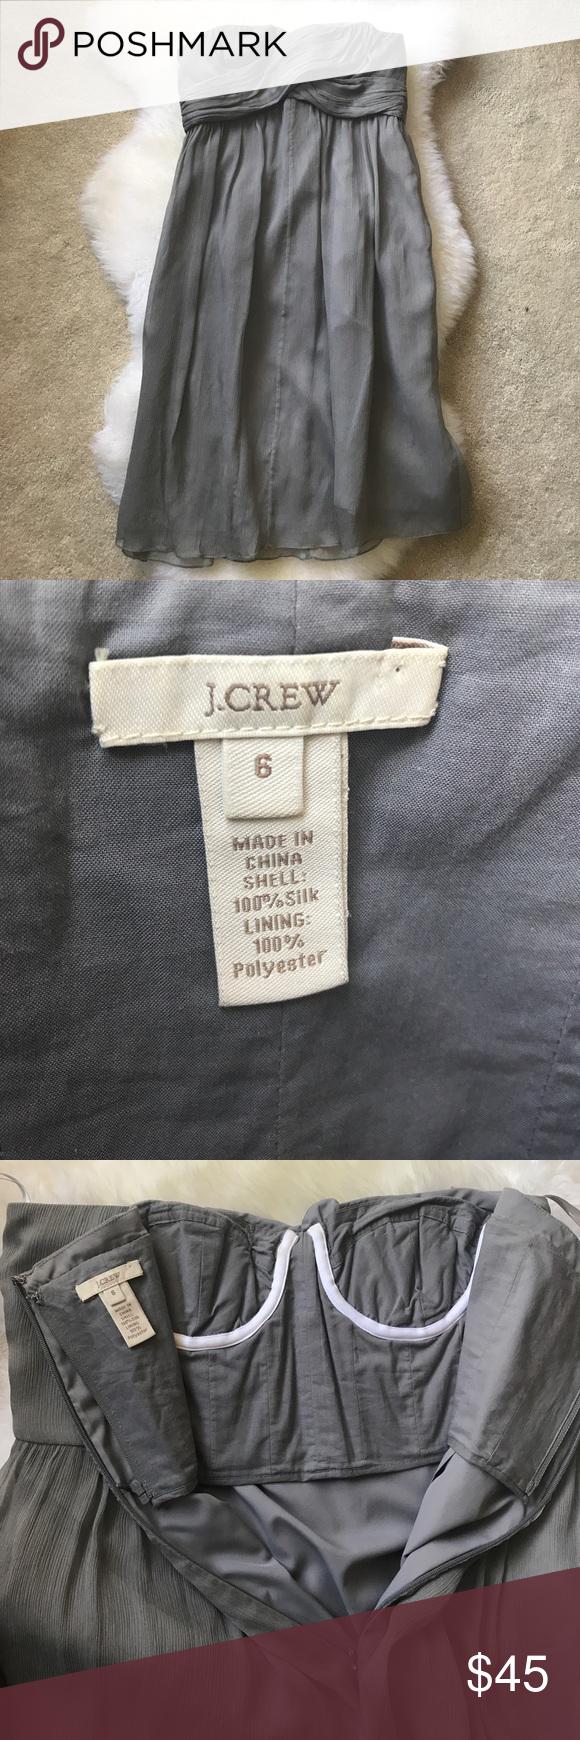 J crew taryn dress dusty shale color